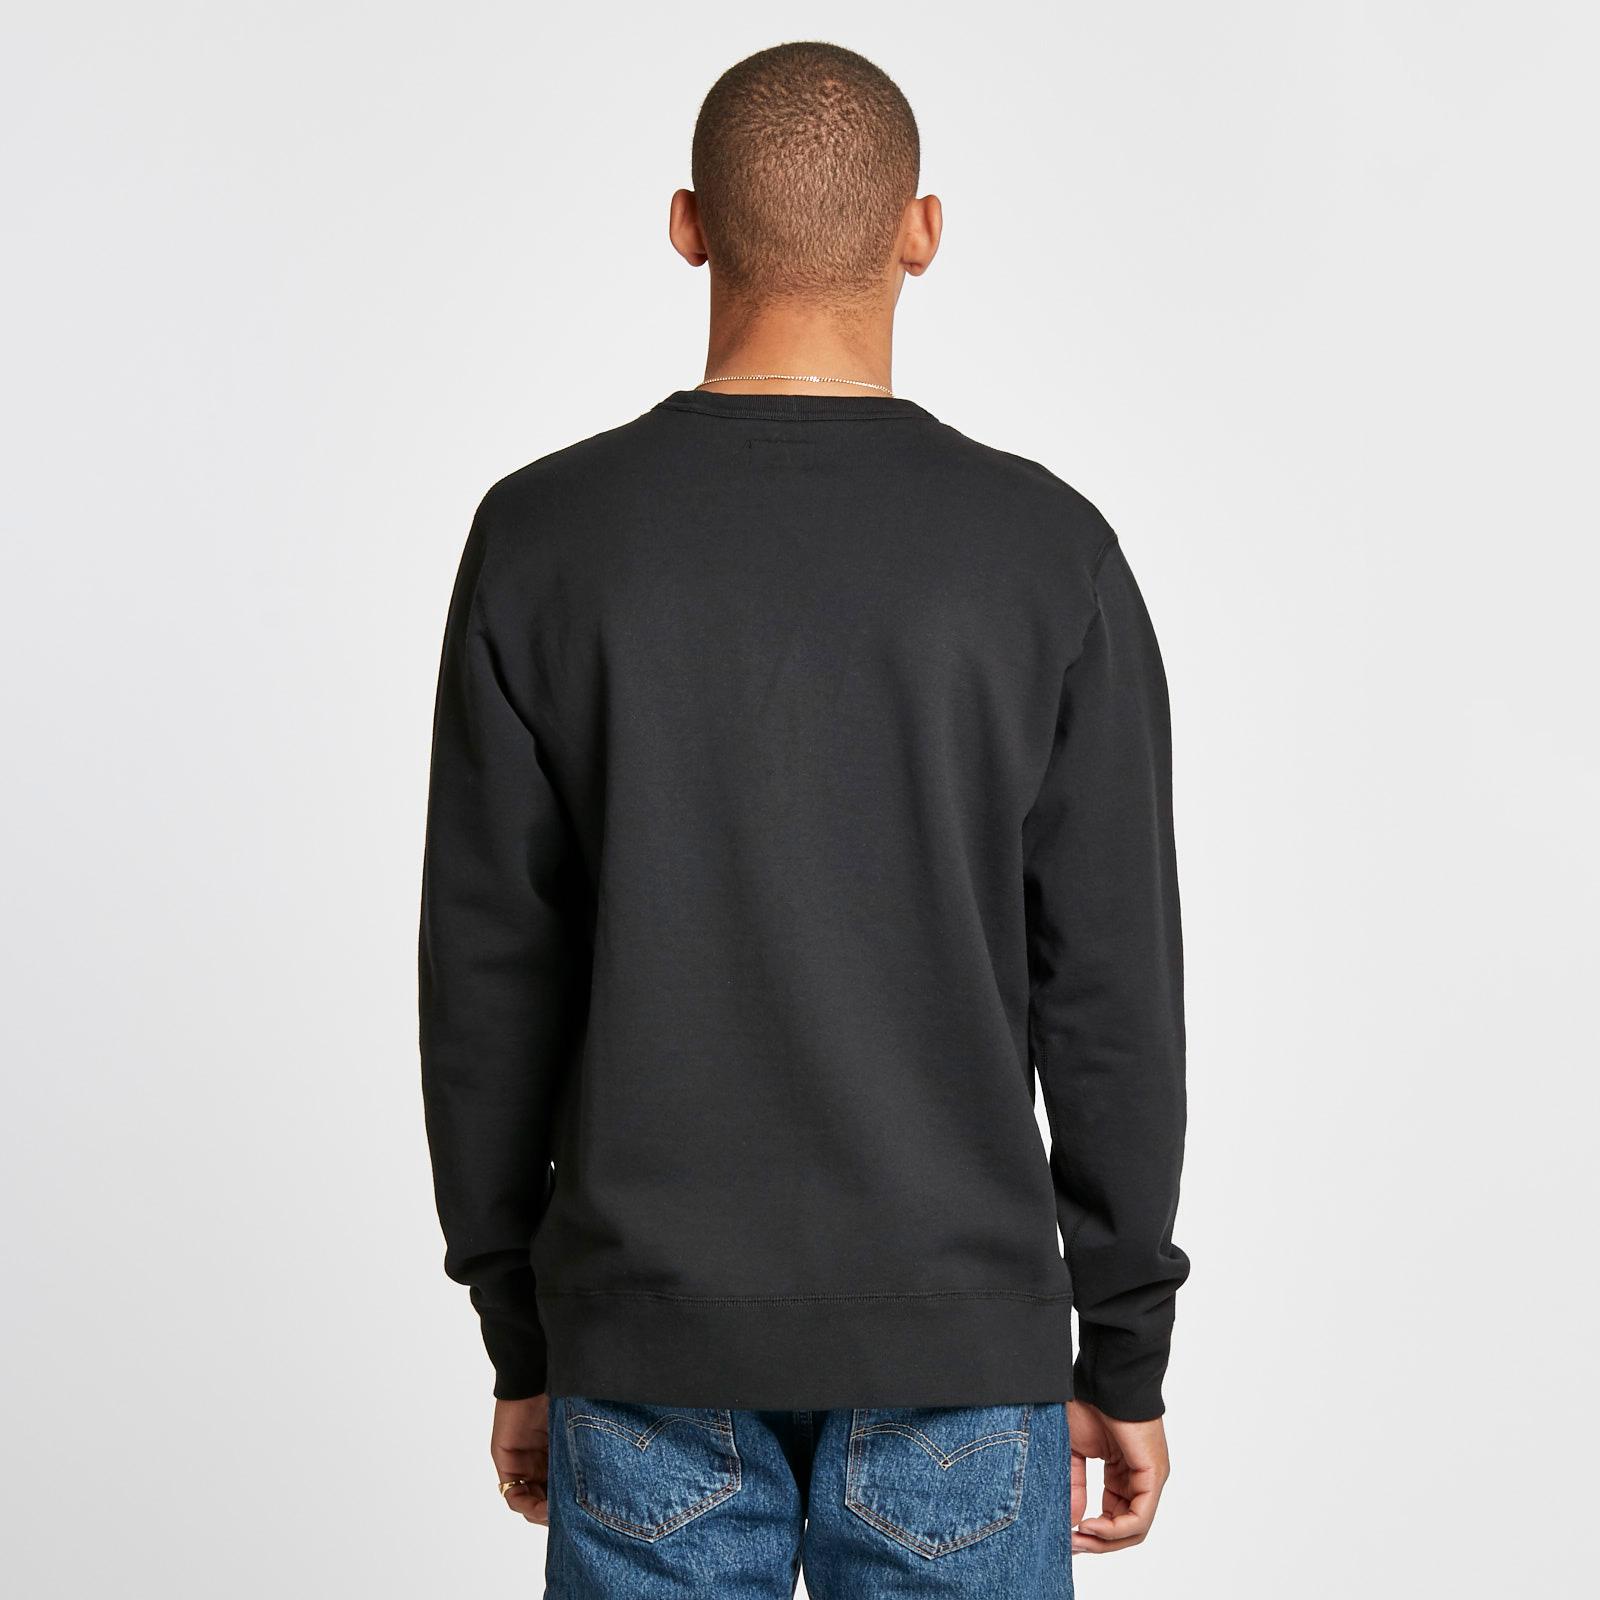 Converse Crew Sweatshirt X Golf Le Fleur 10009027 A01